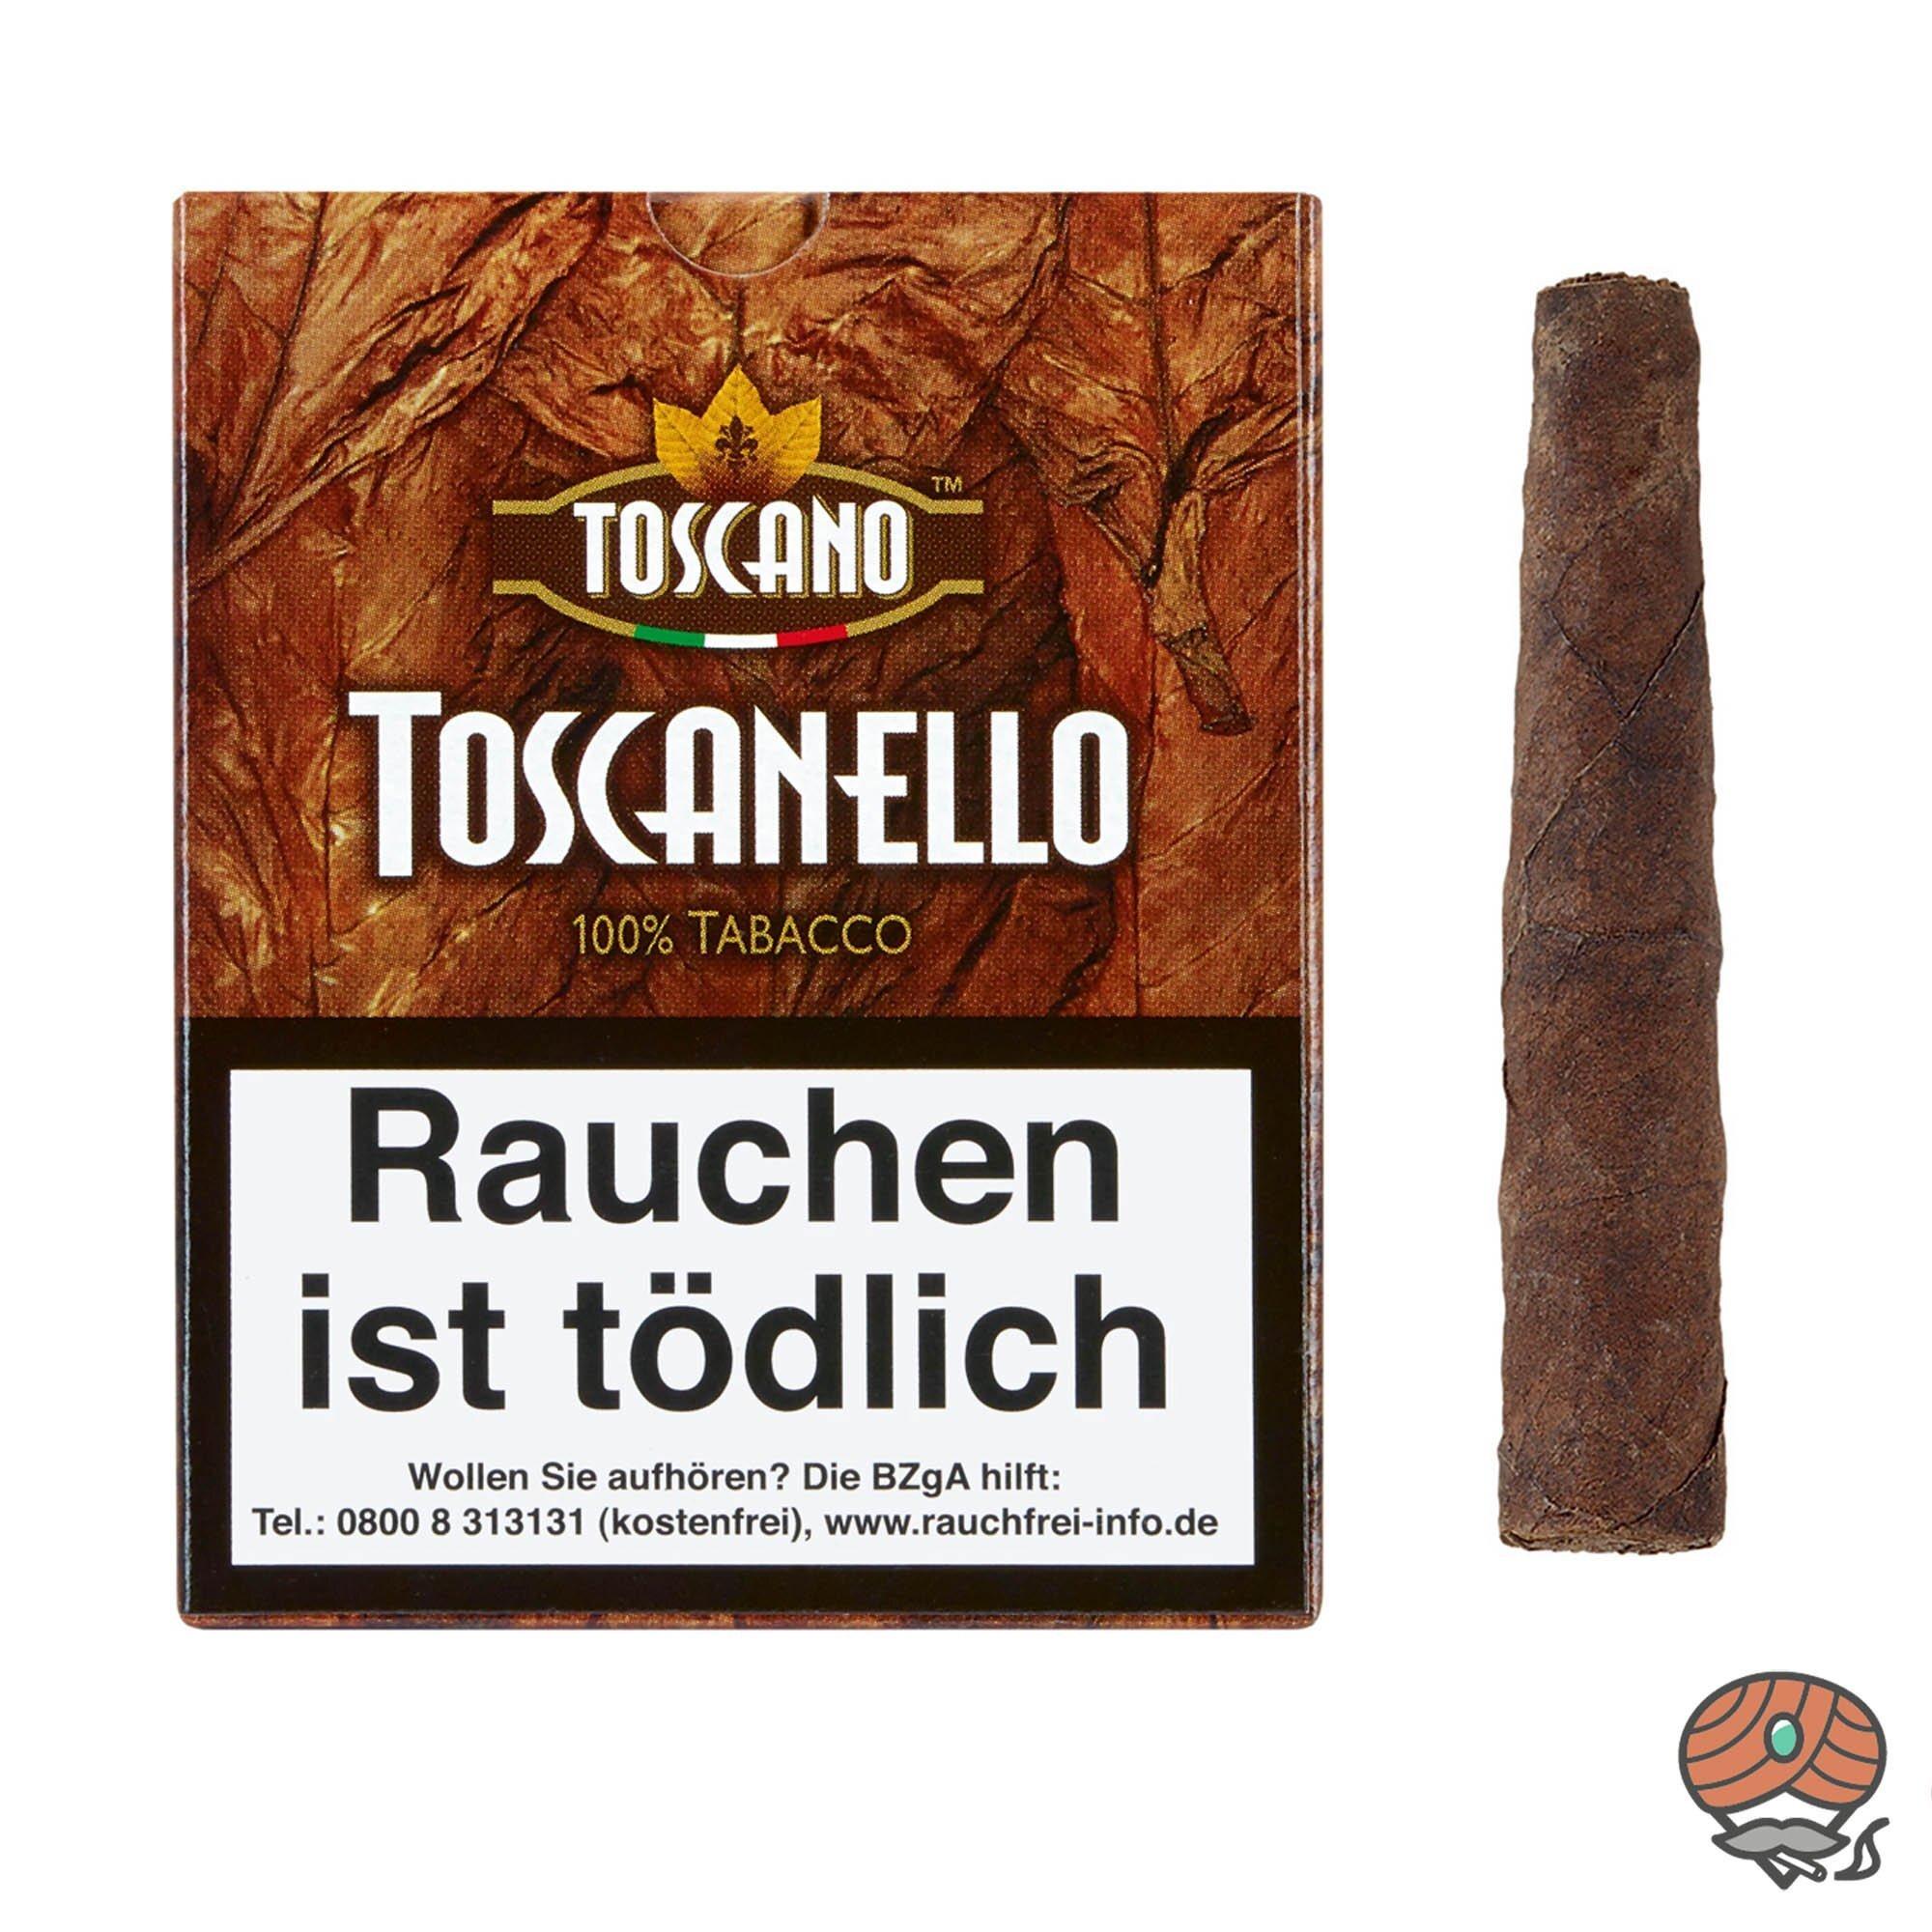 Toscano Toscanello 100% Tabacco Zigarren 5 Stück